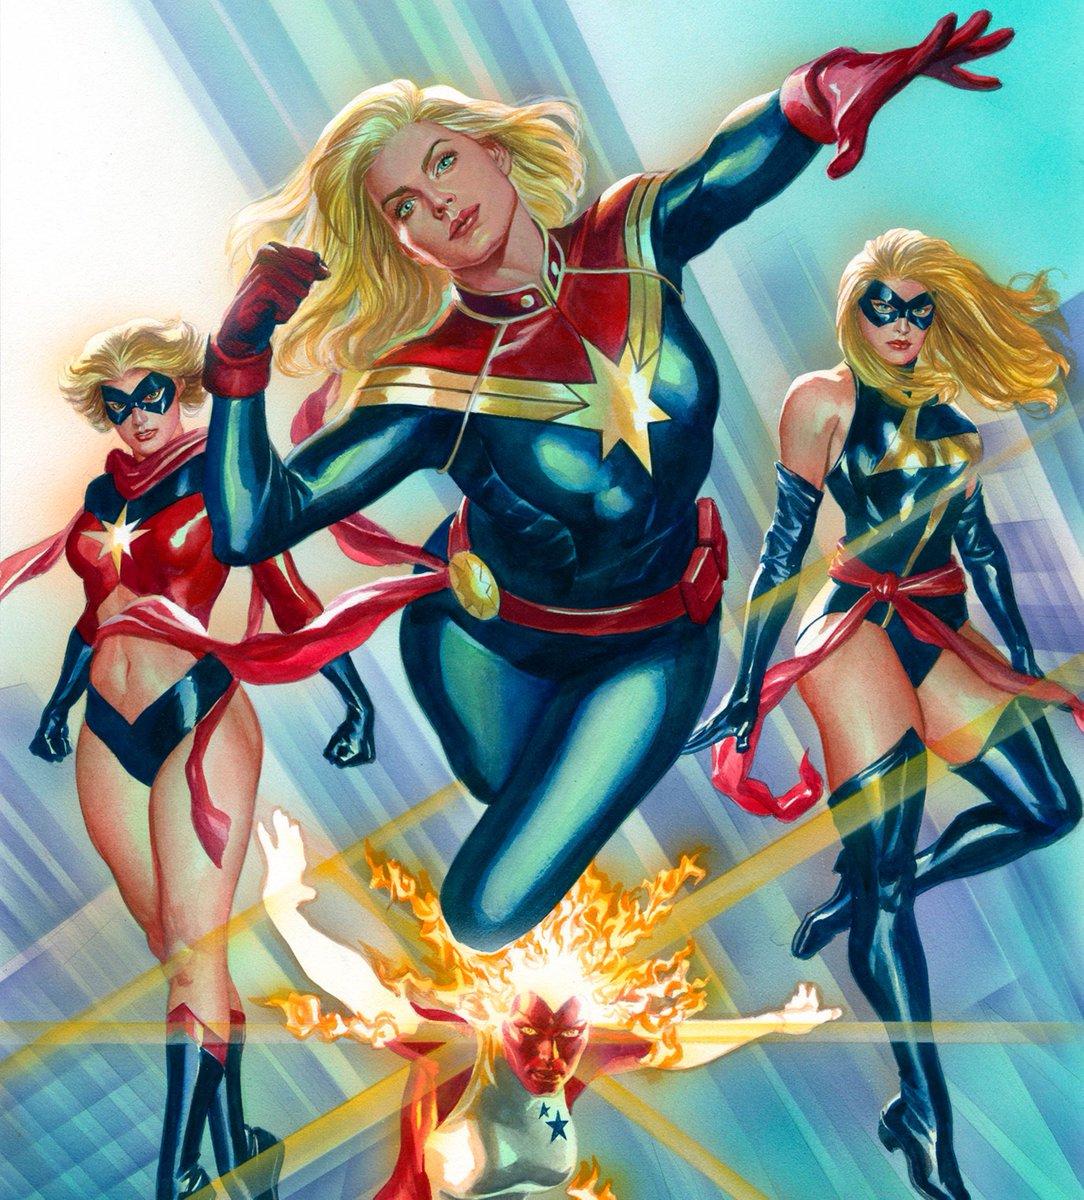 Captain Marvel   #captainmarvel  #marvelcomics #tgif #comicart<br>http://pic.twitter.com/yVcP8MVr2Q